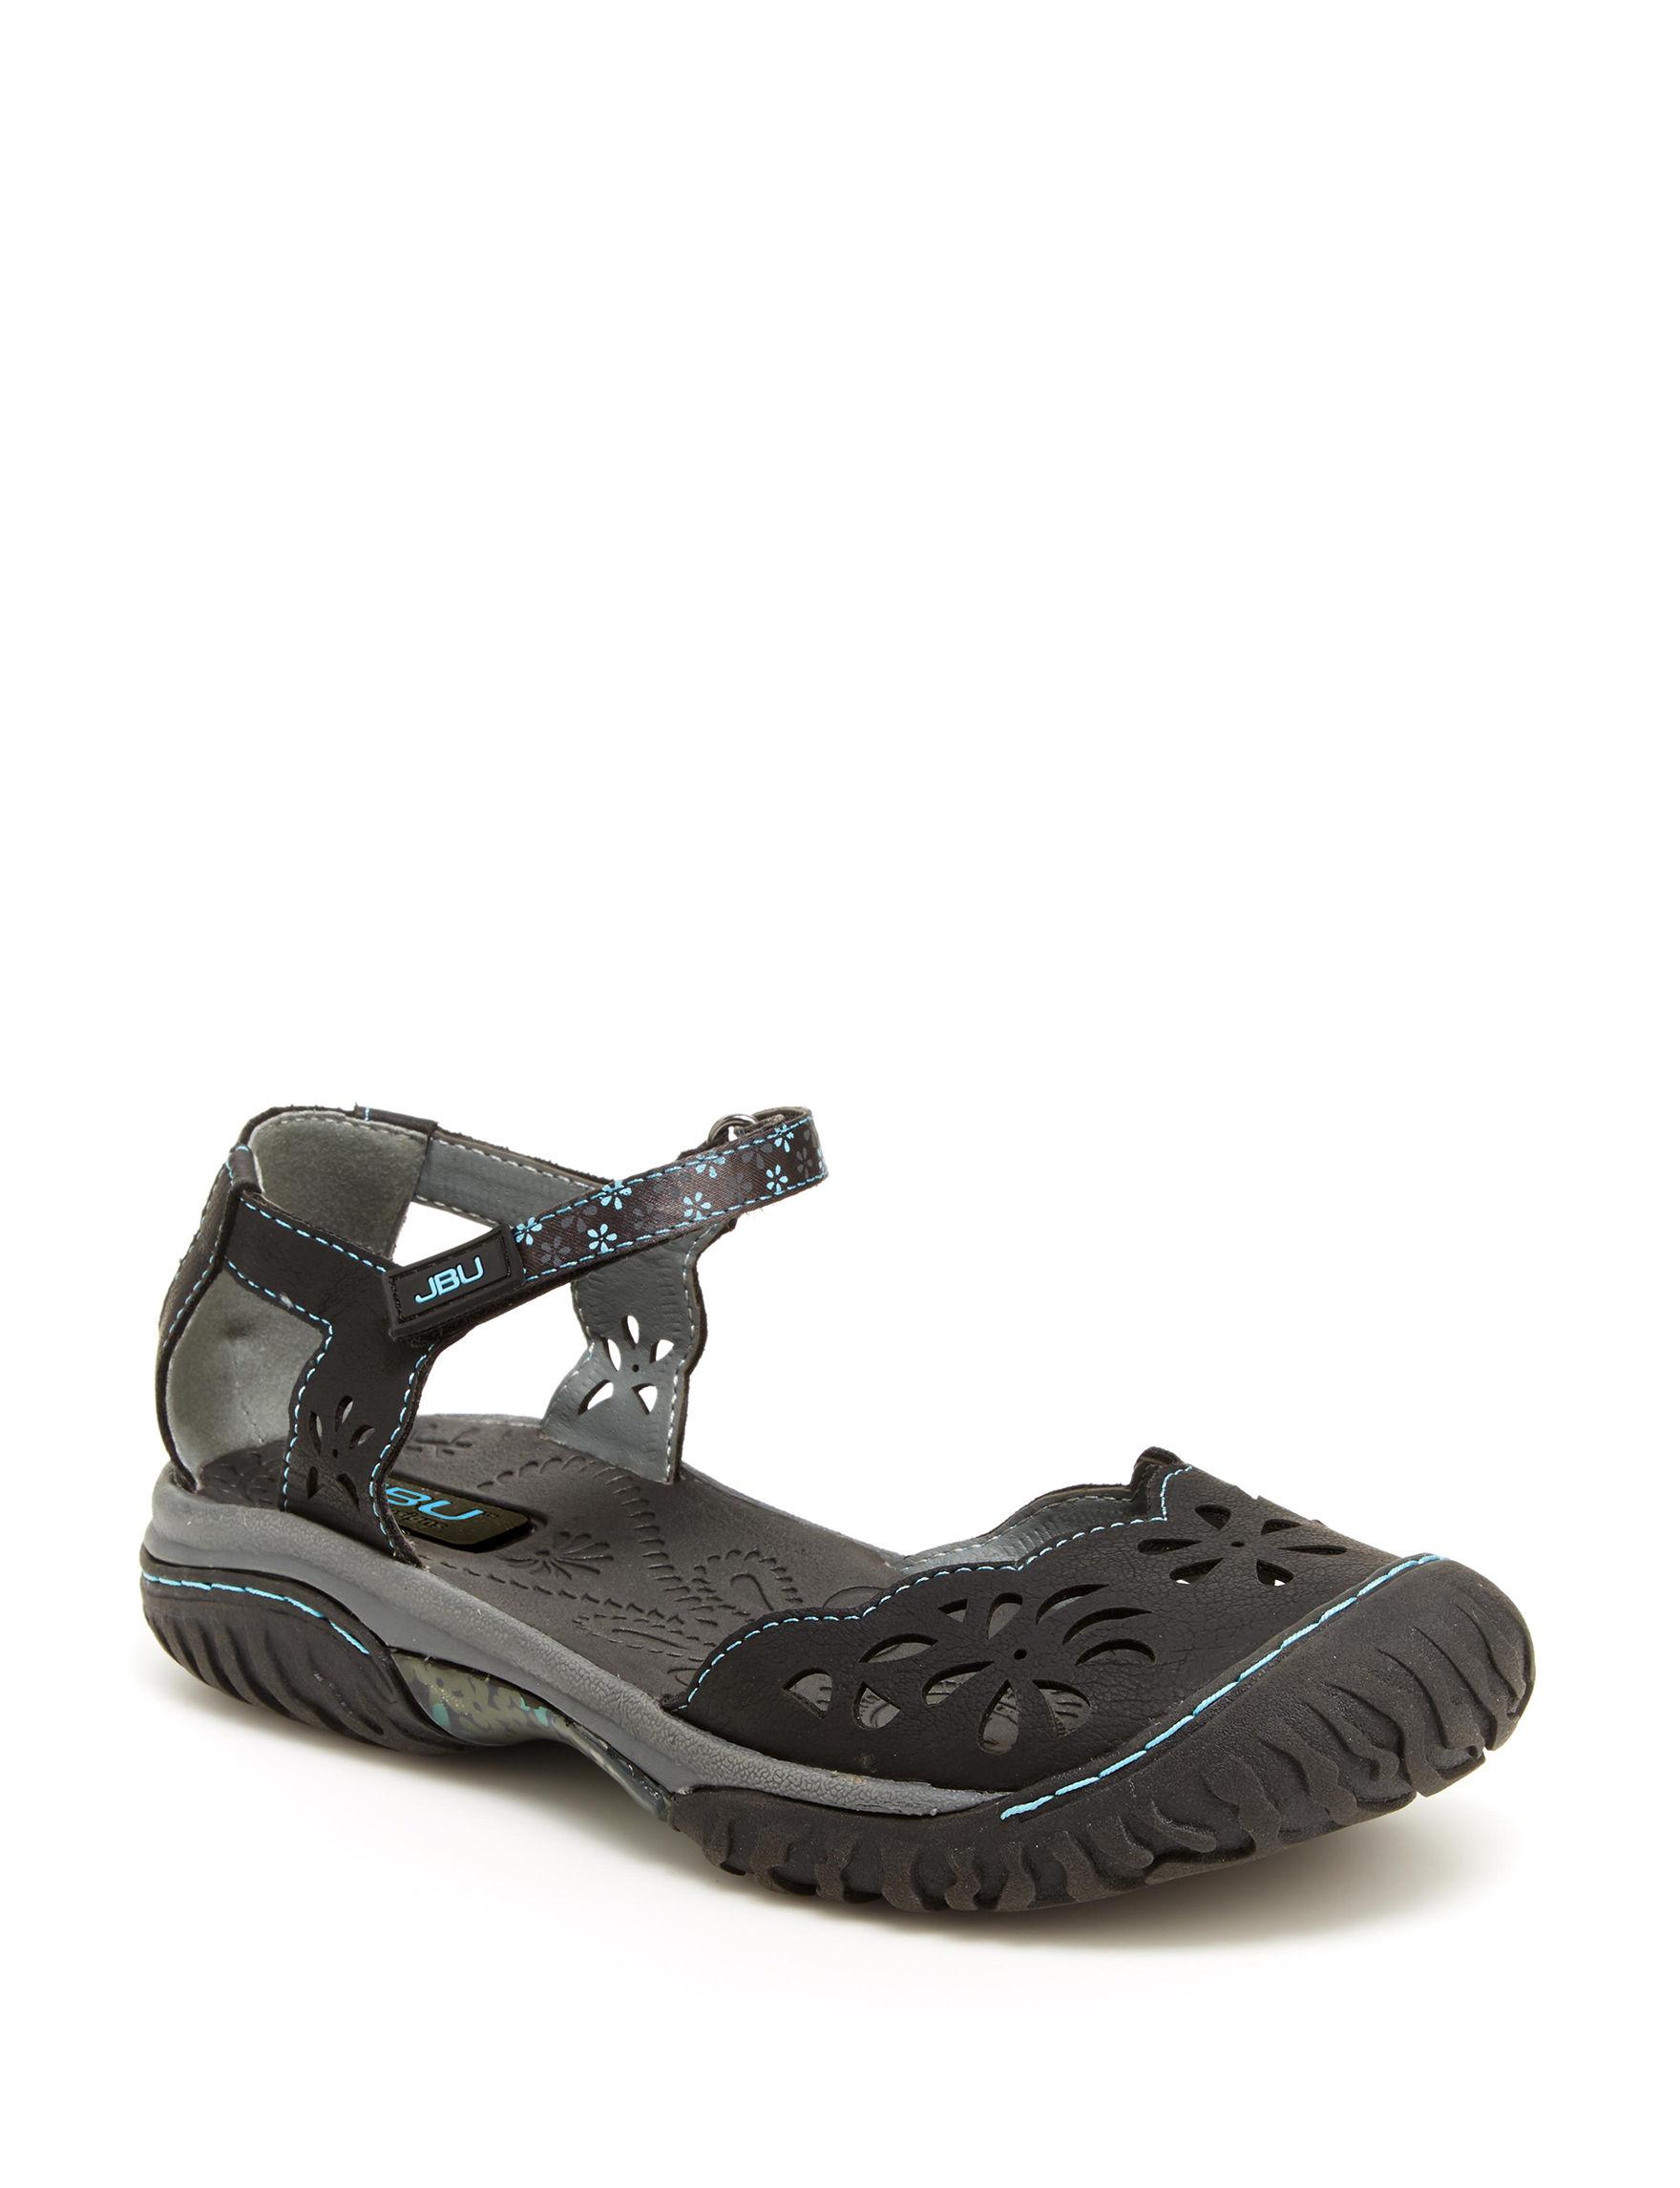 JBU Black Sport Sandals Comfort